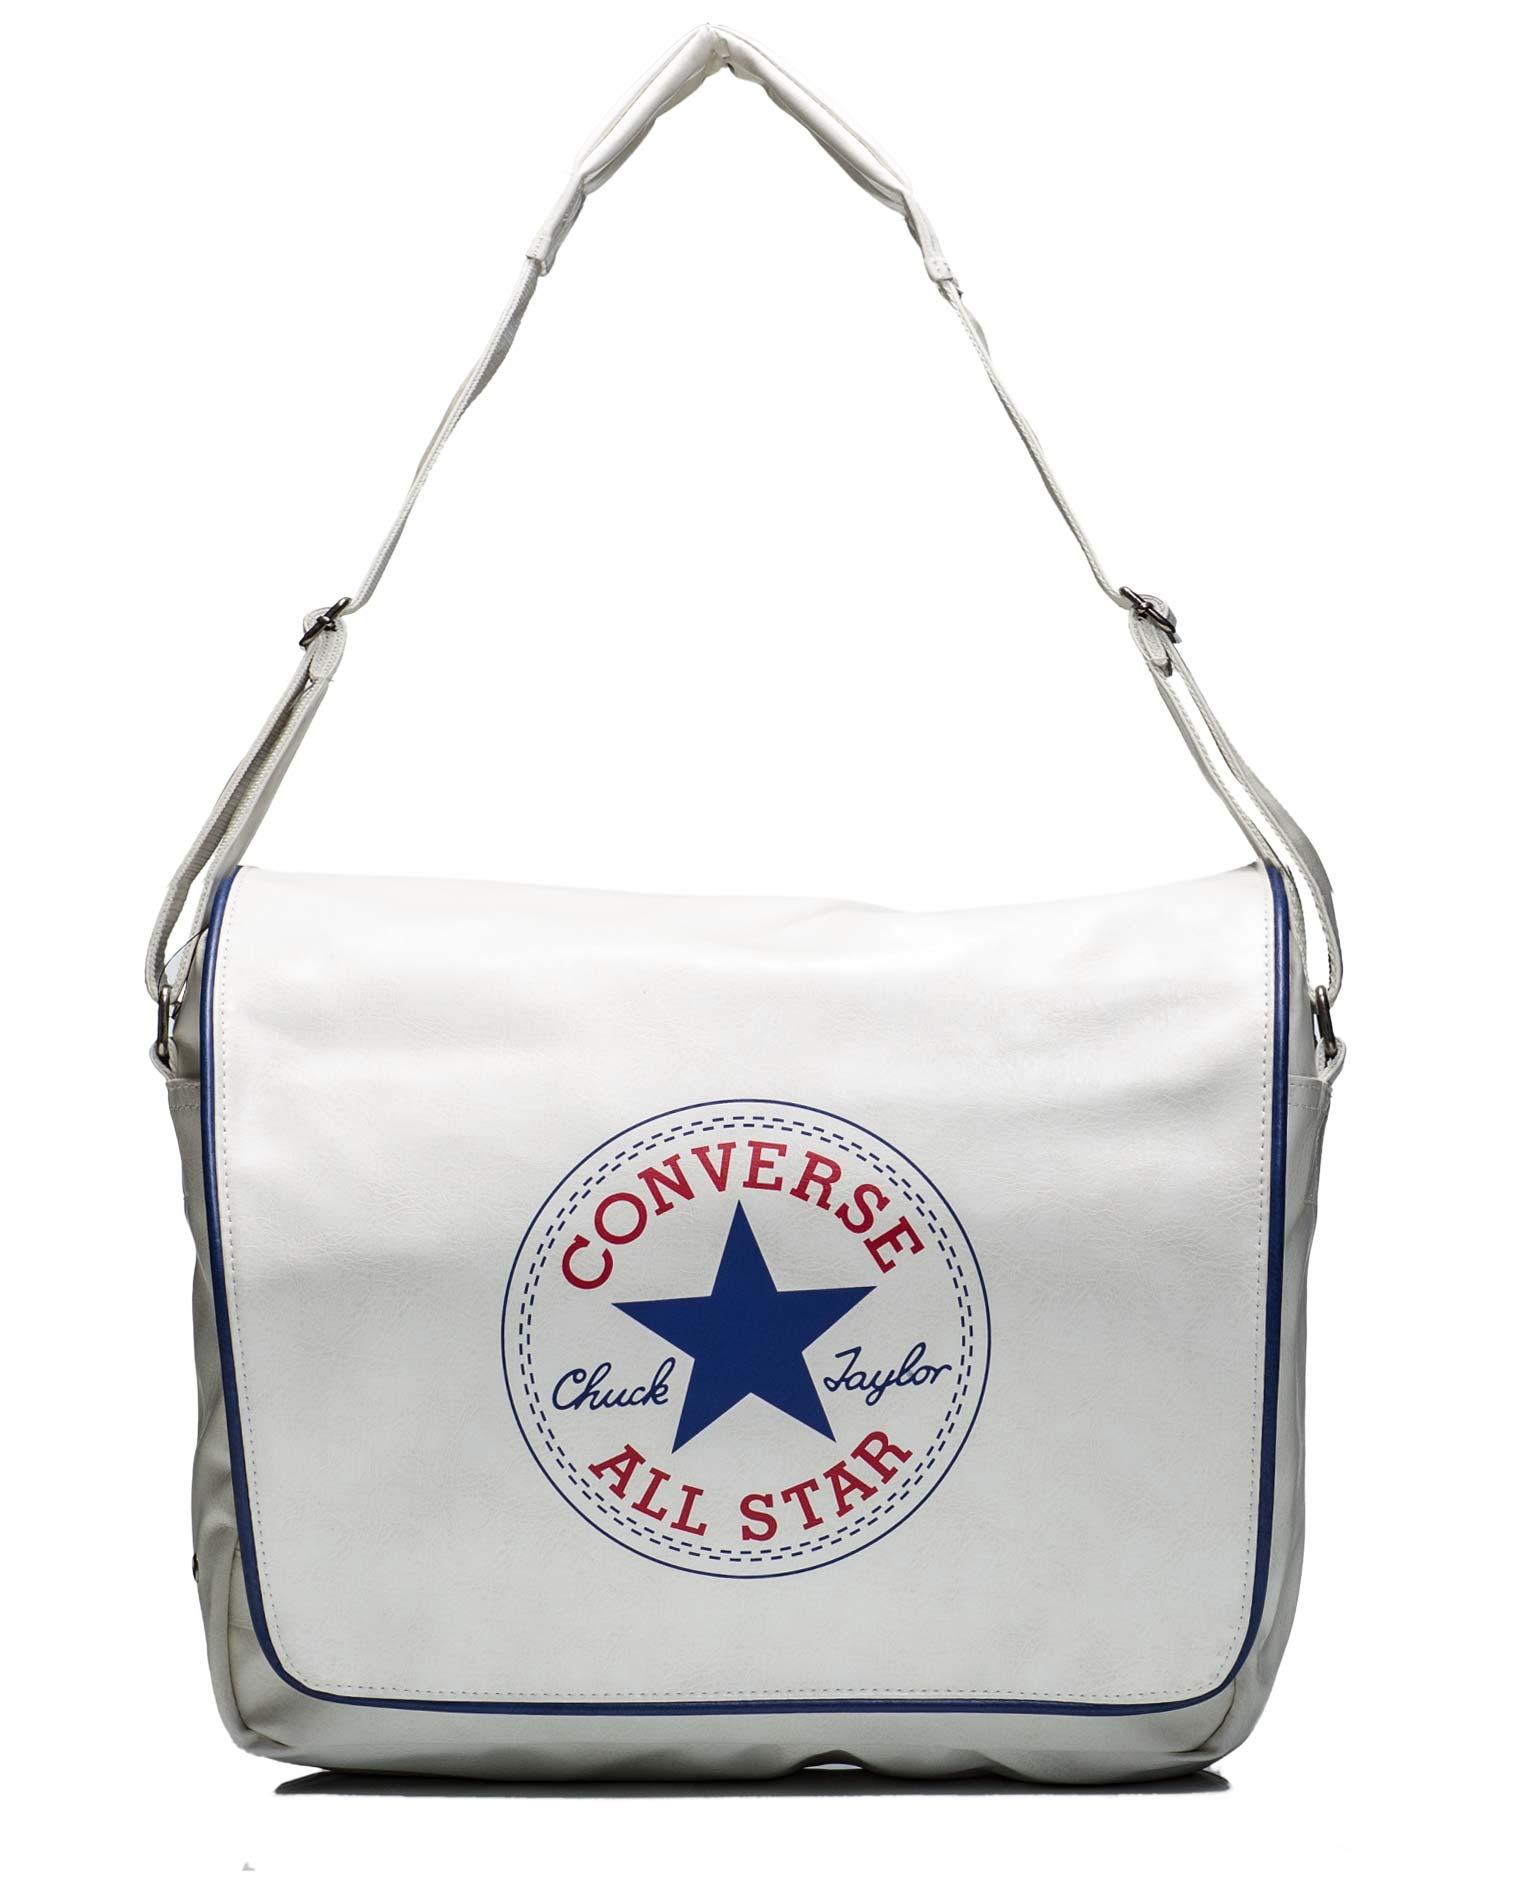 white converse bag